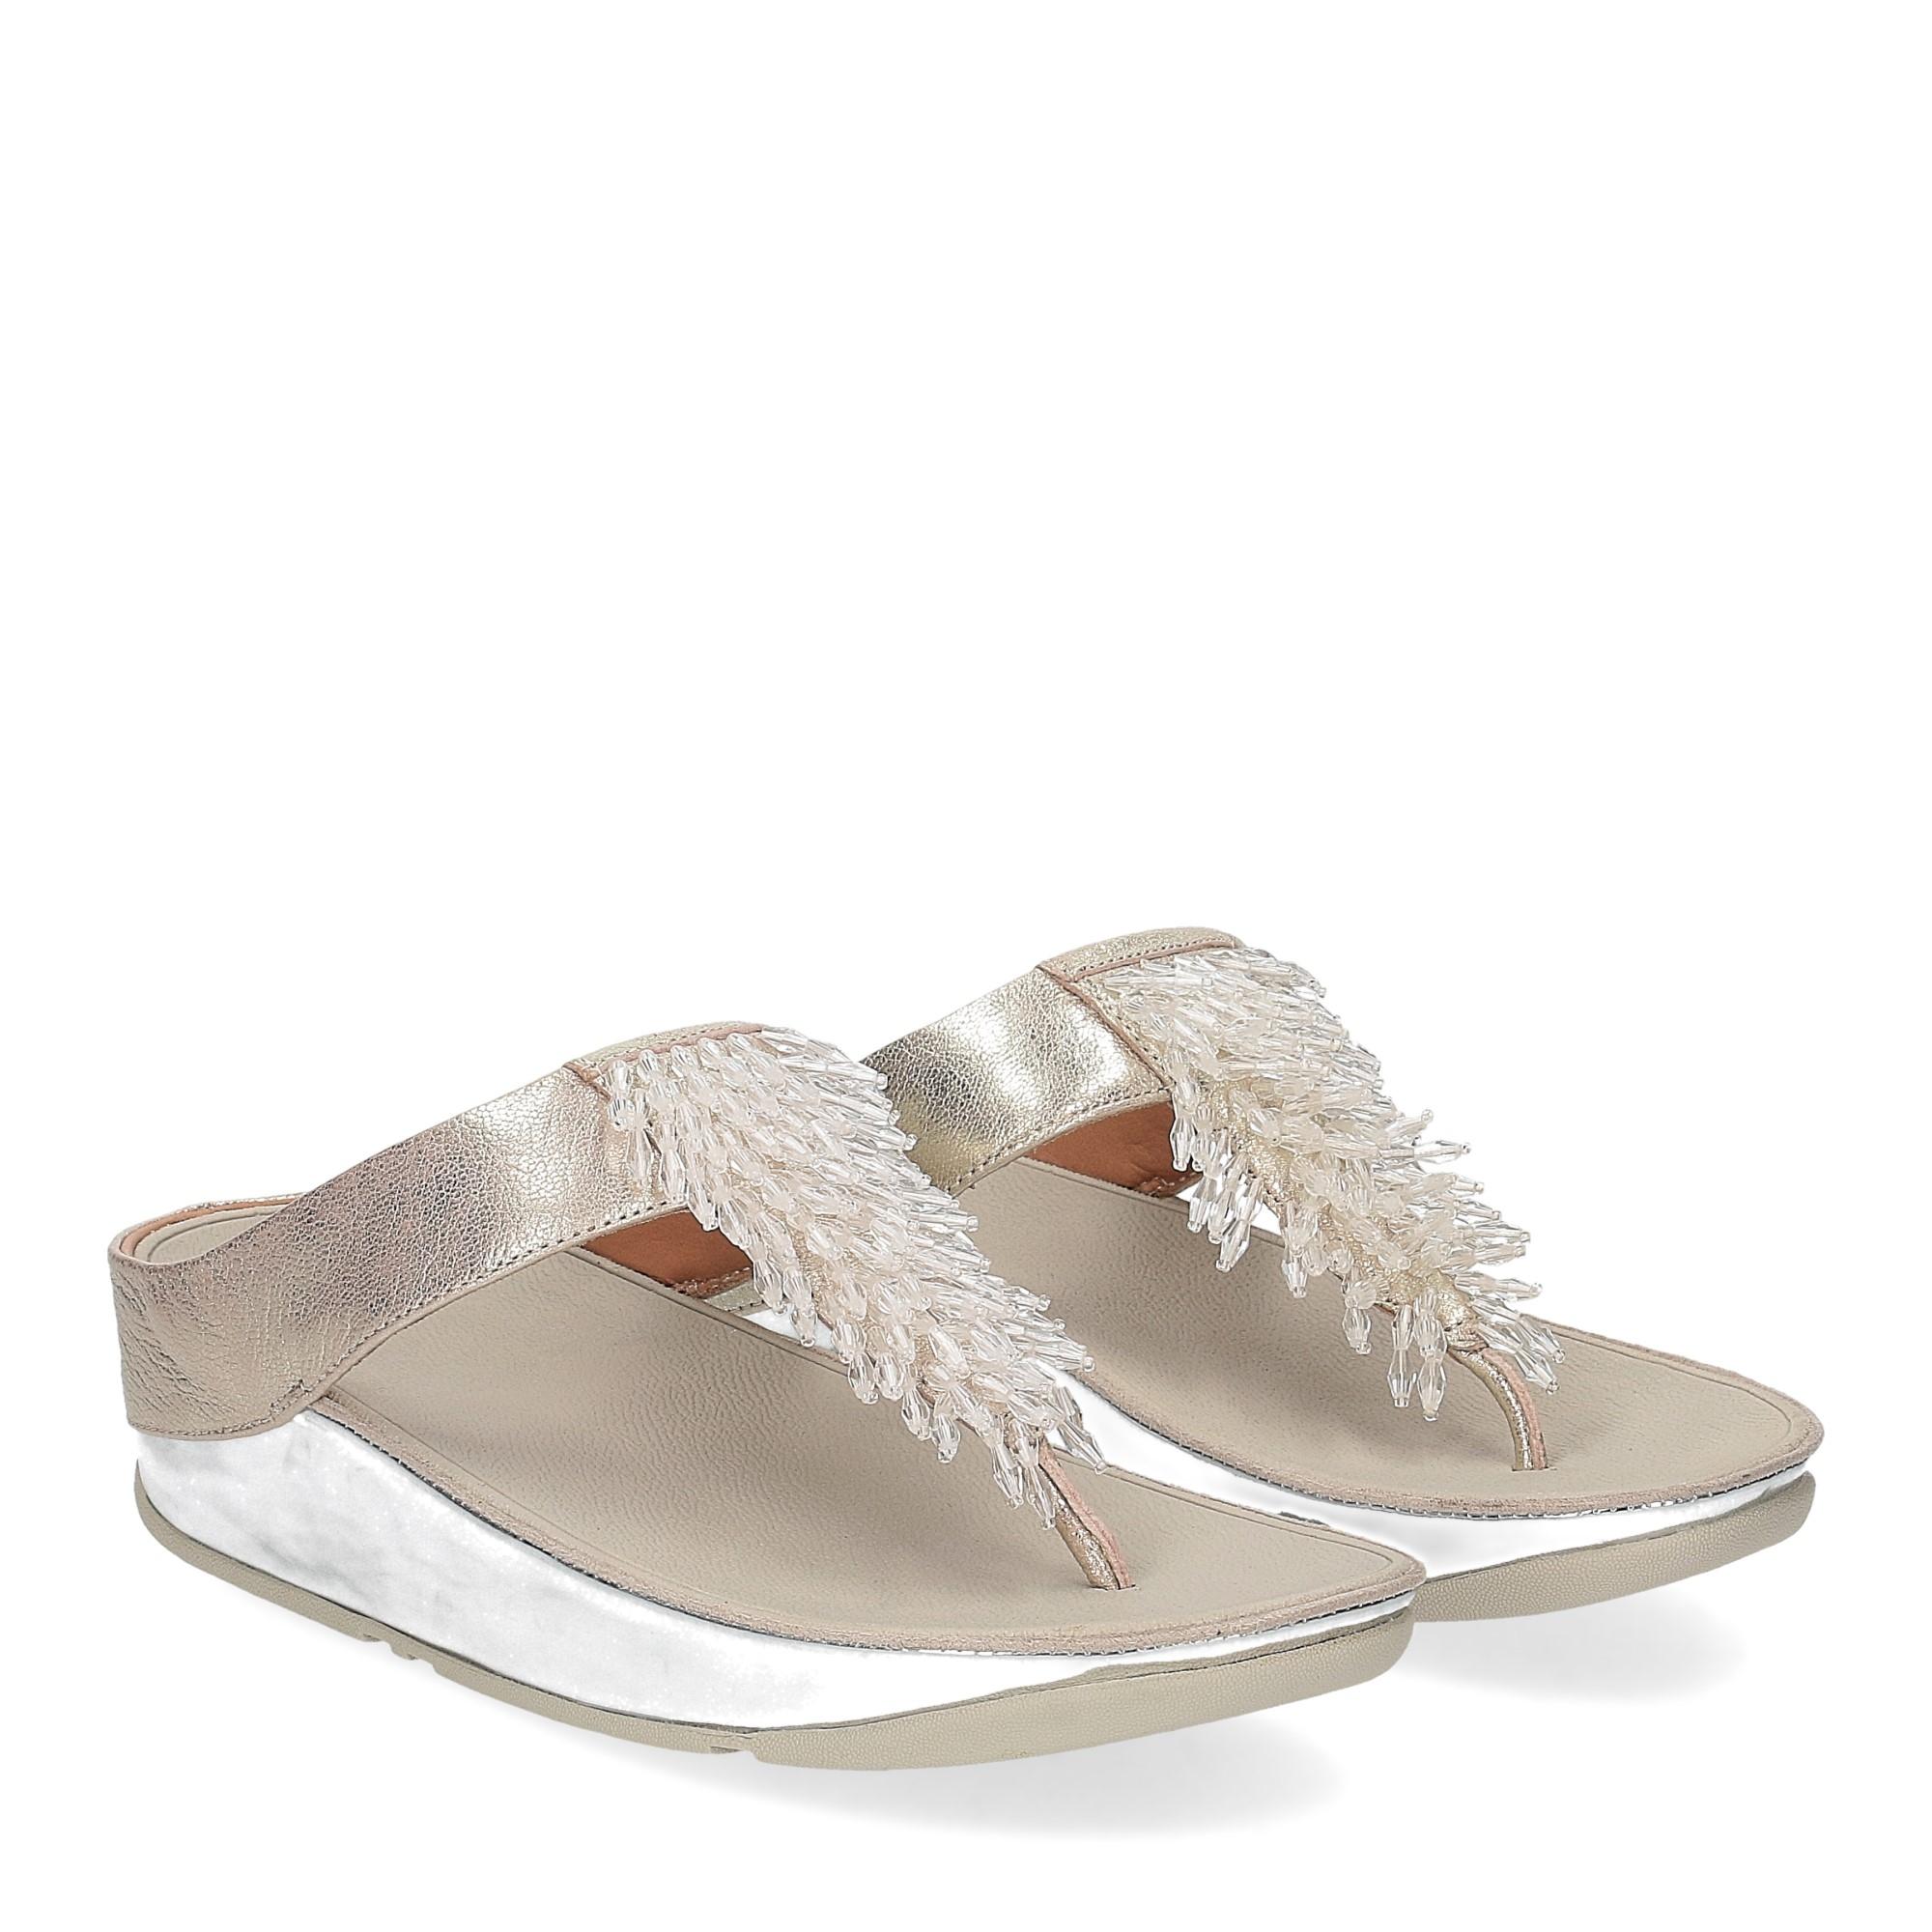 Fitflop Rumba toe thong sandal metallic silver